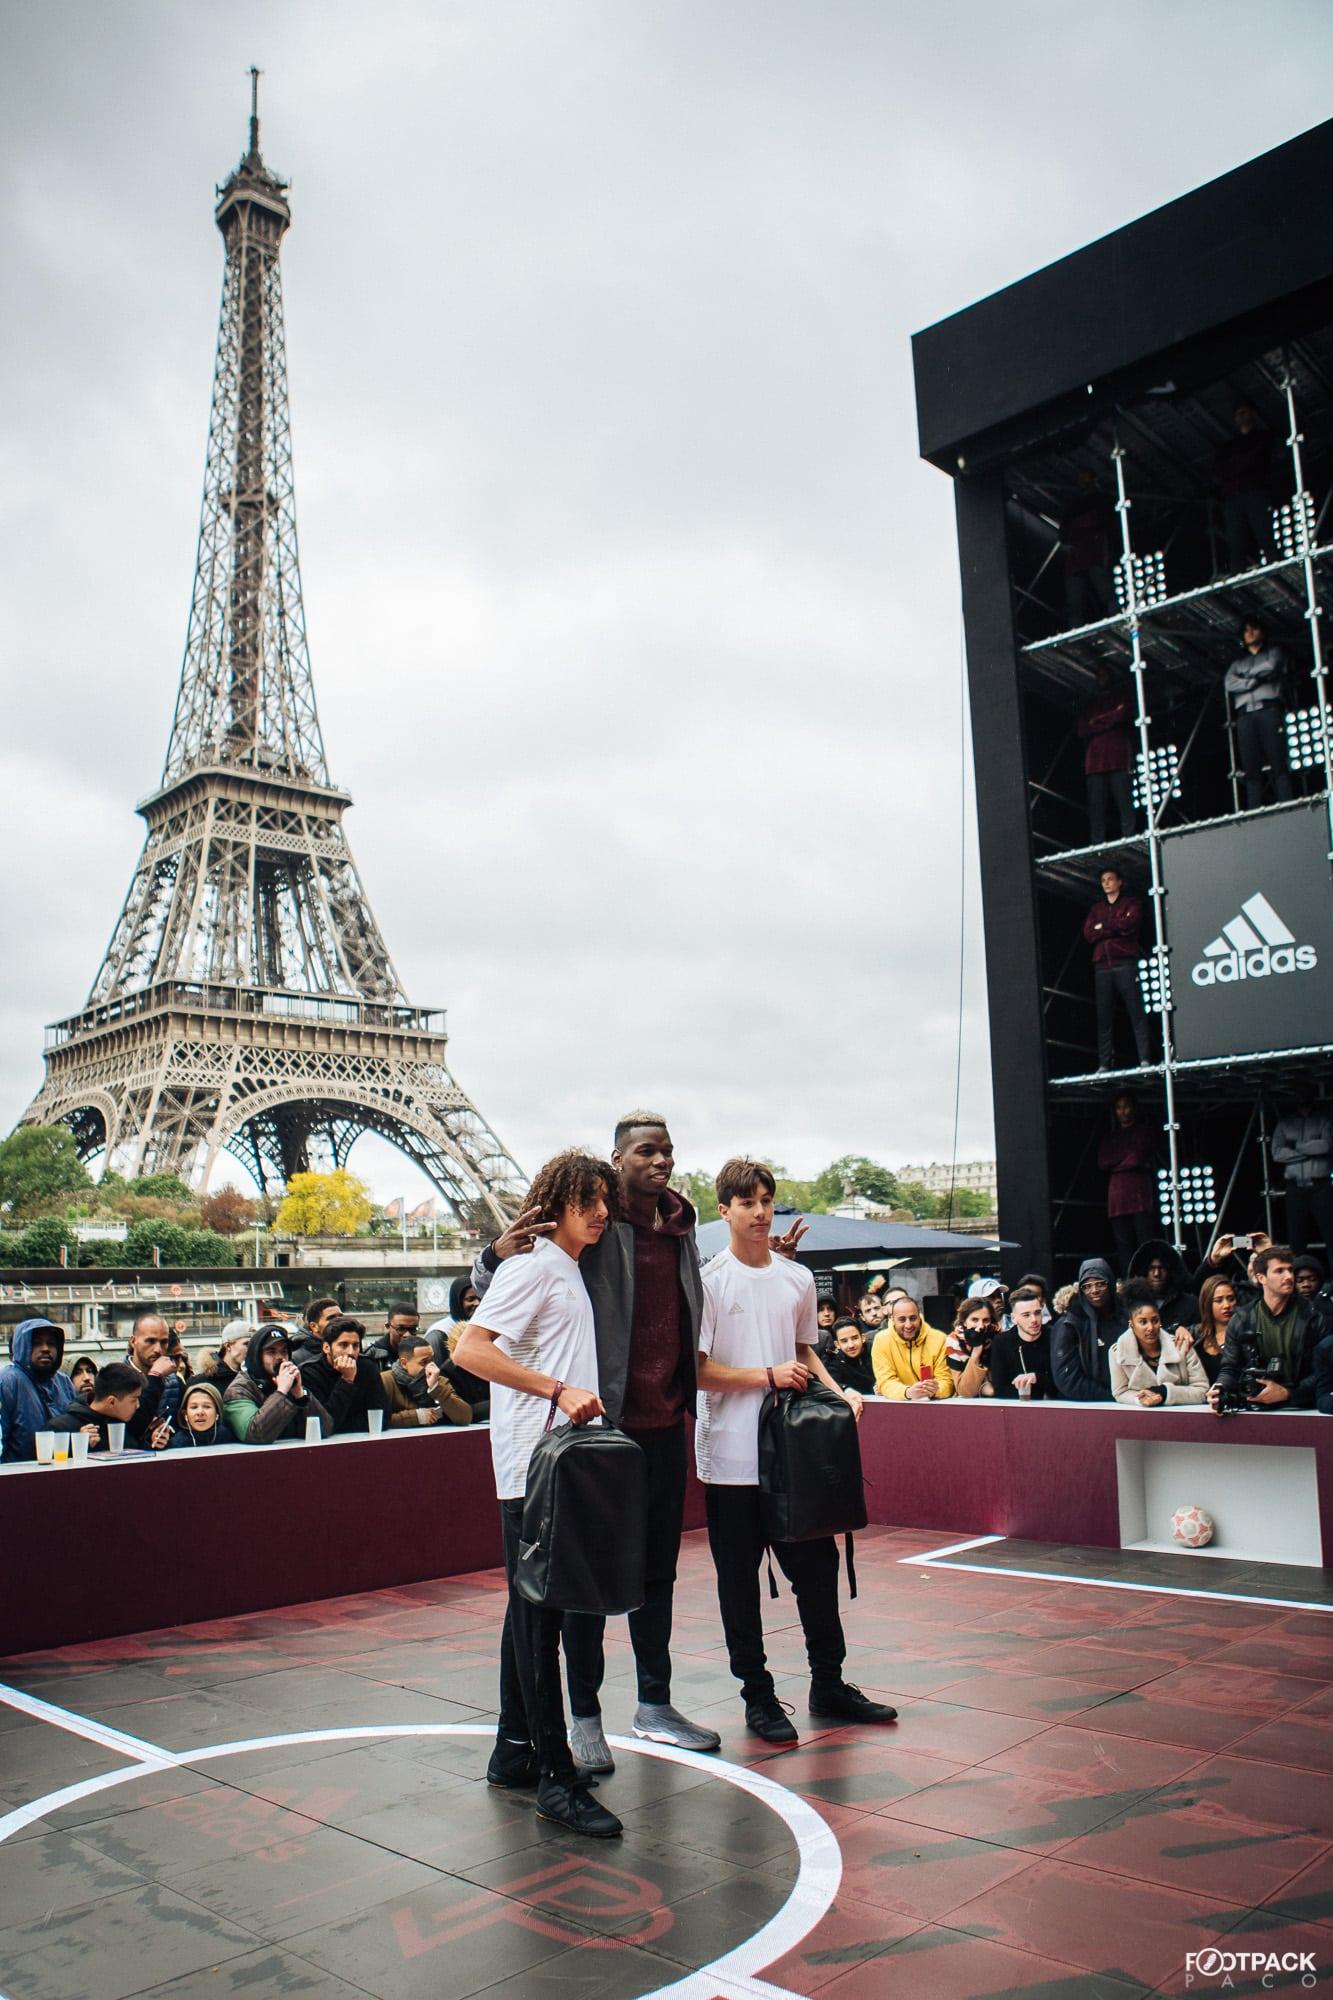 paul-pogba-adidas-collection-saison-3-avril-2018-3